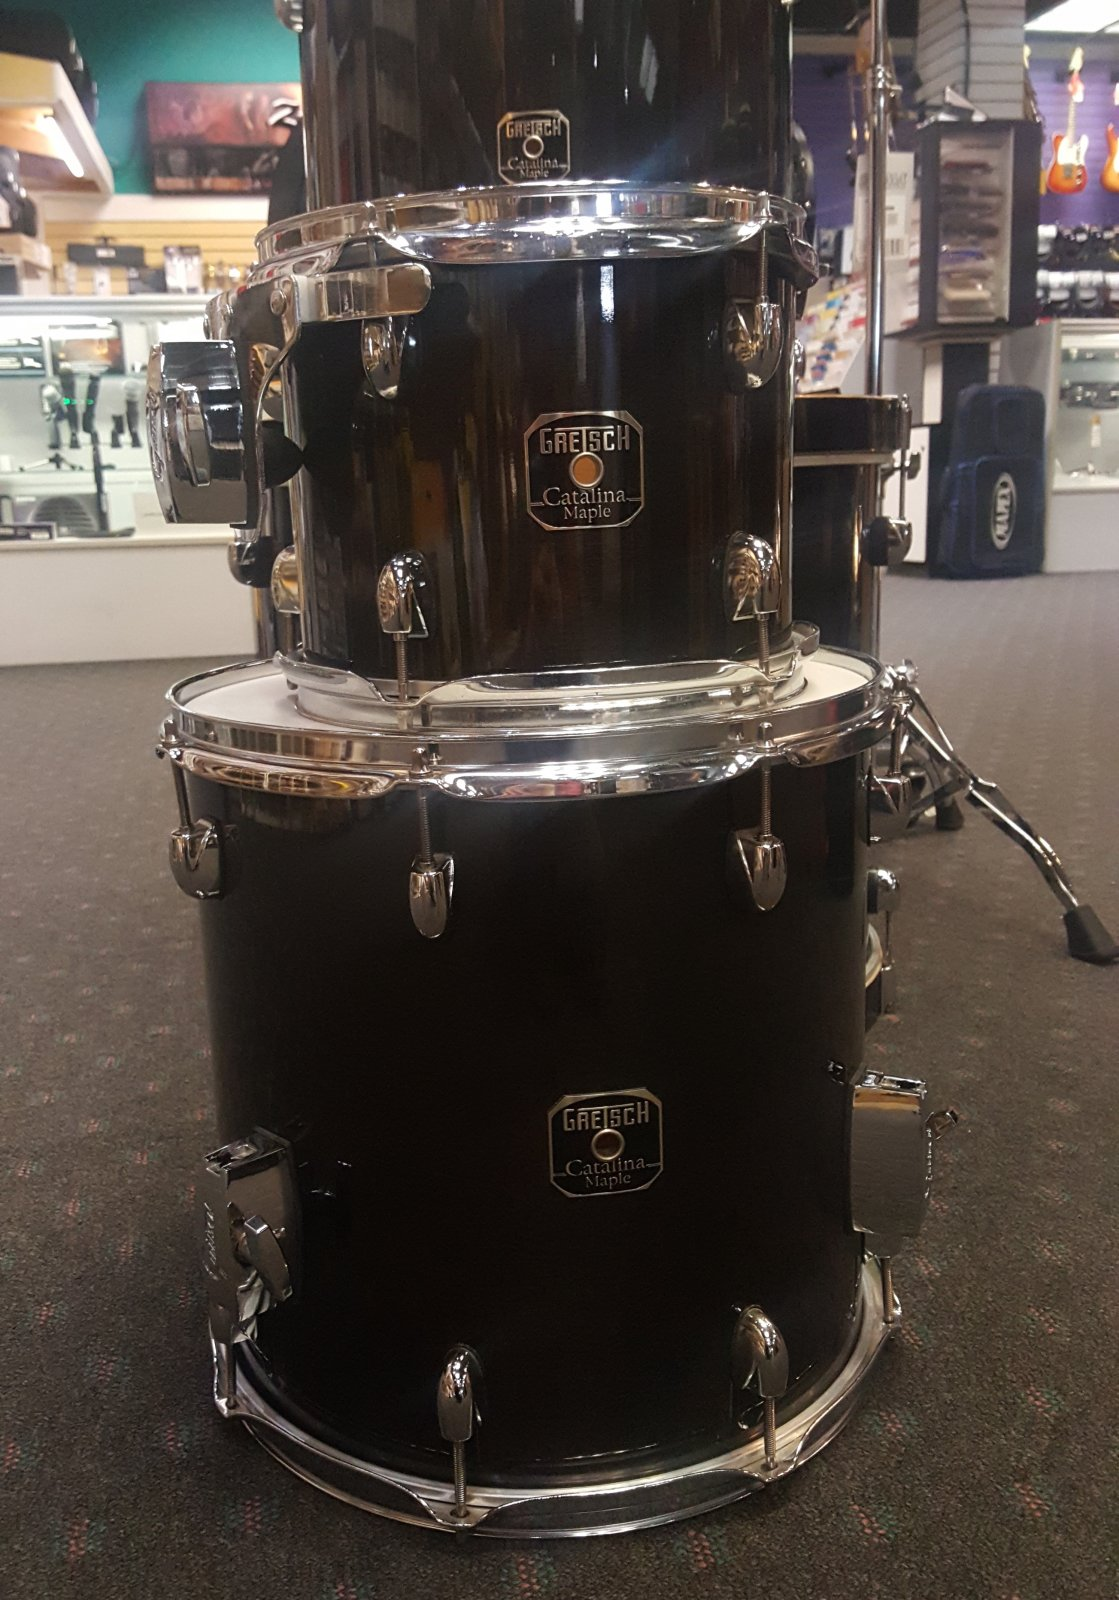 Used Gretsch Catalina Maple 7PC. Drum Set - Transparent Ebony